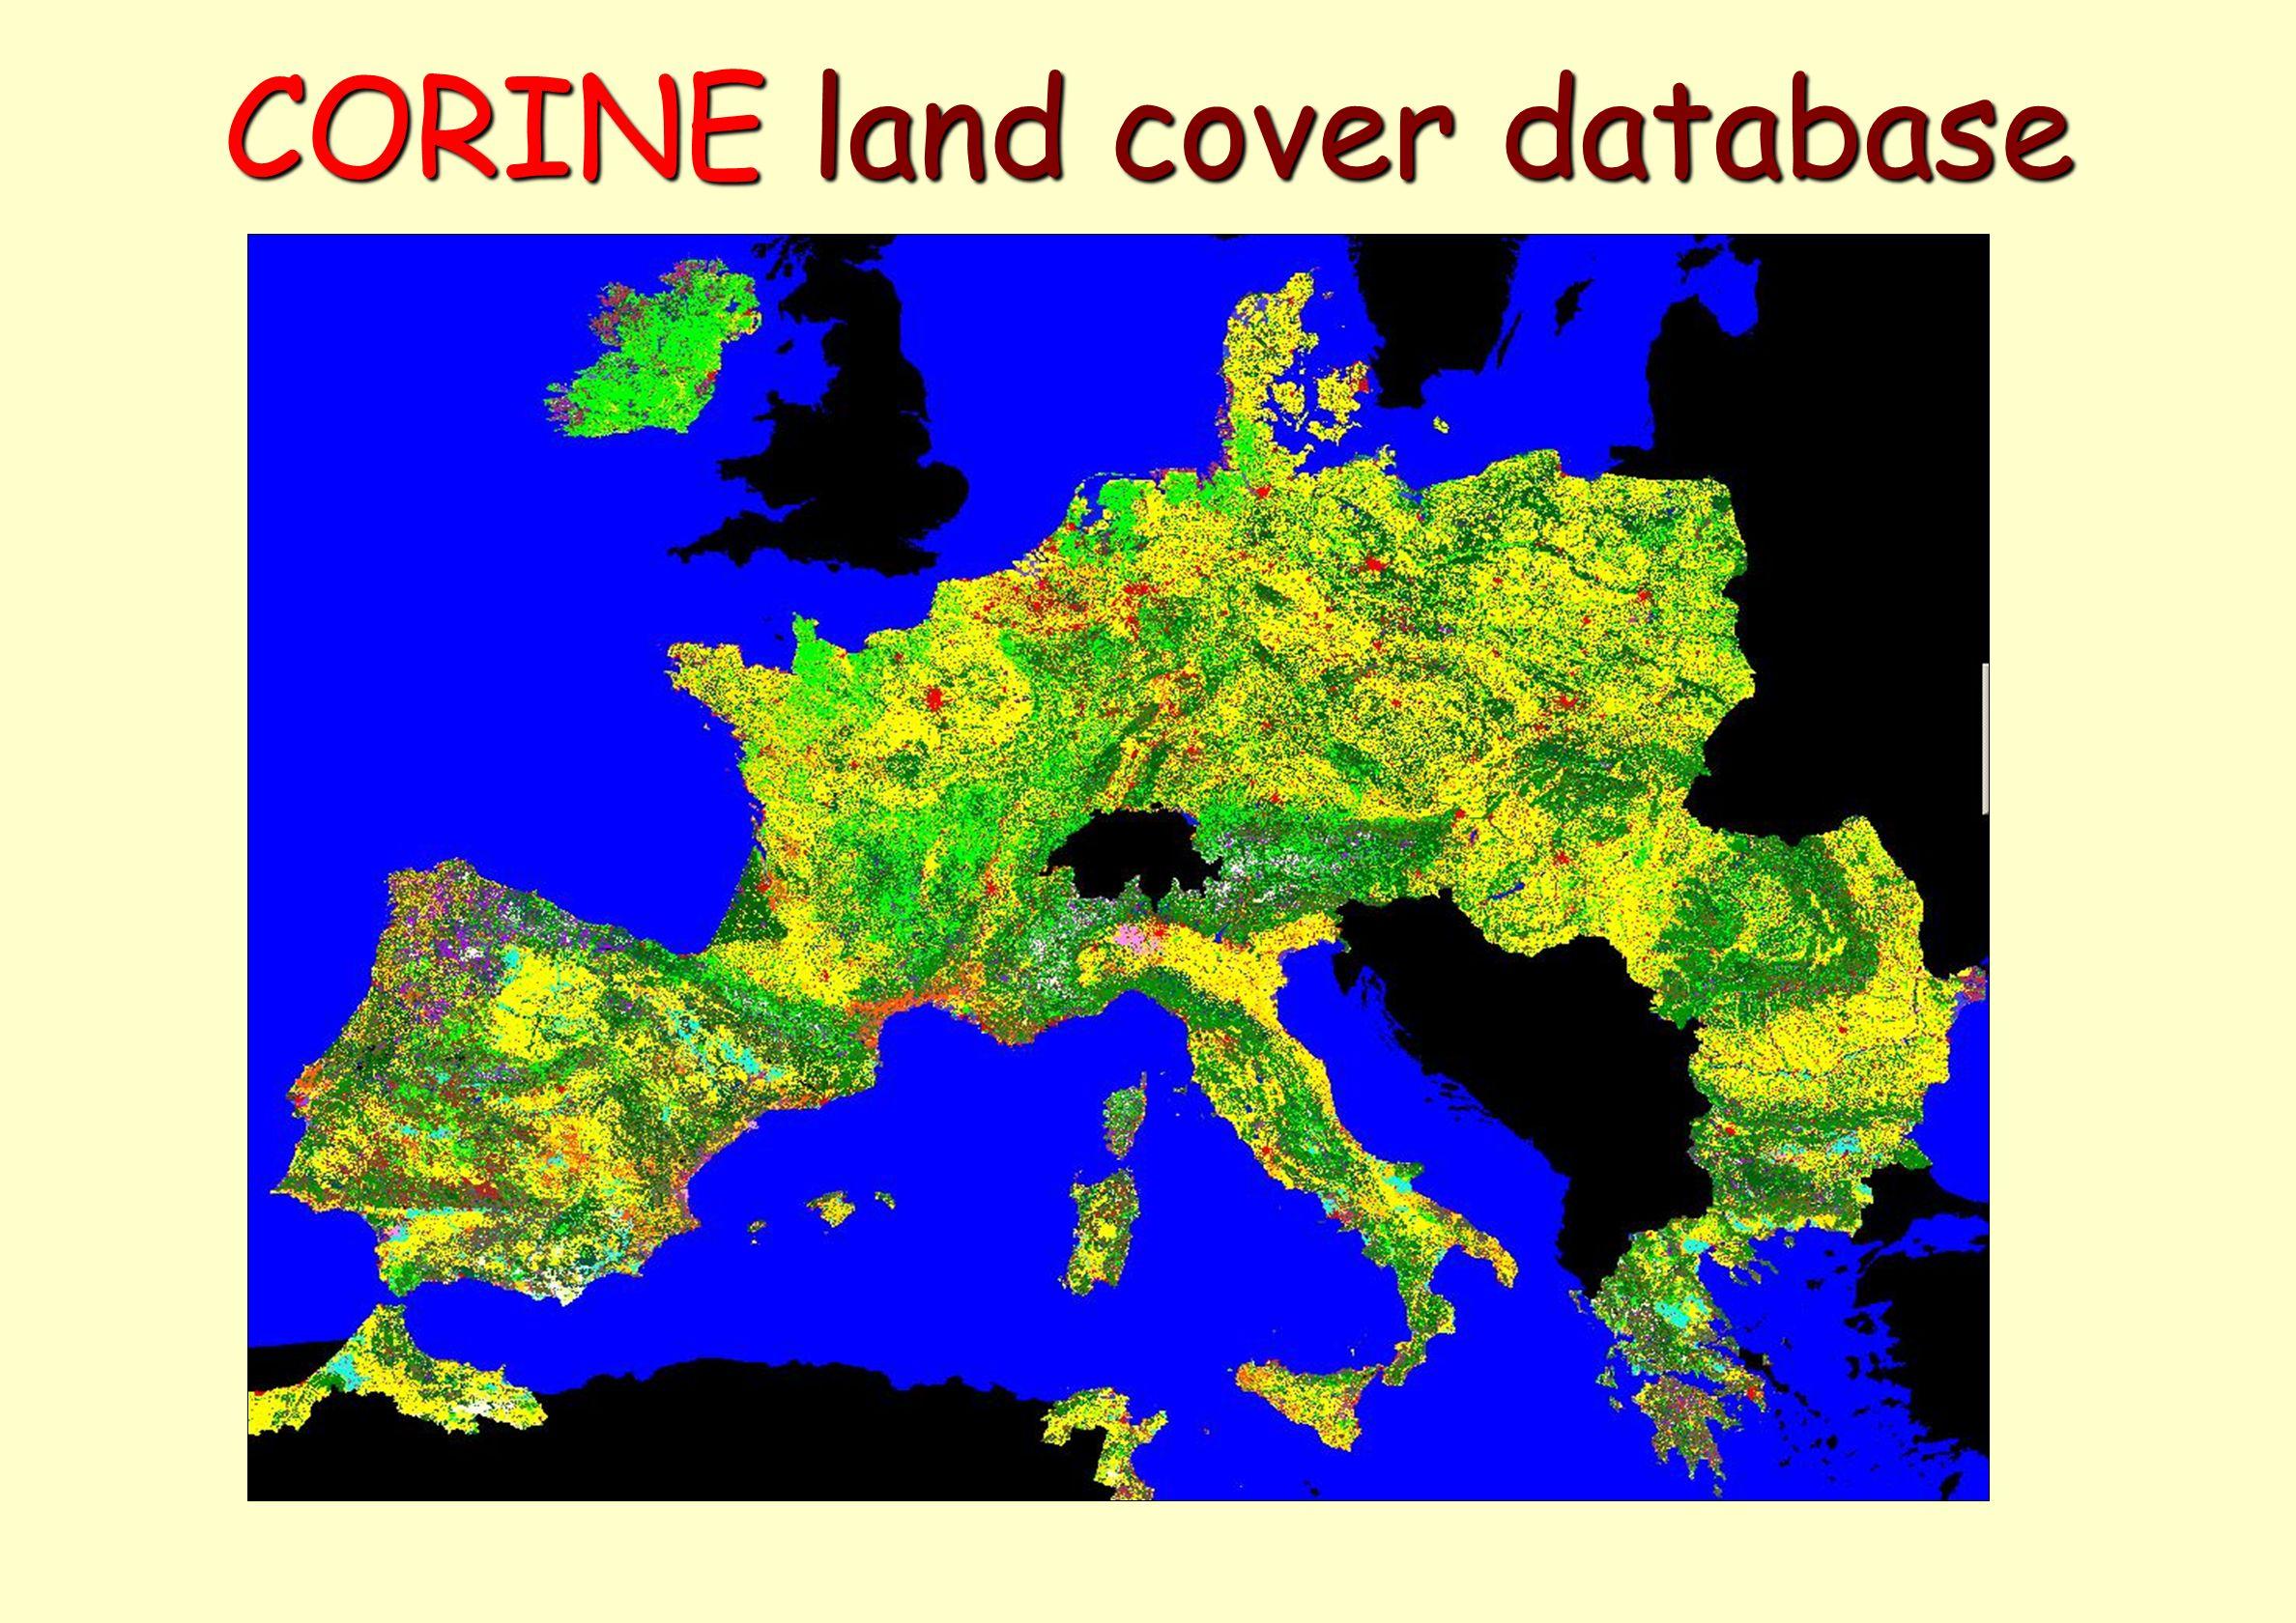 CORINE land cover database